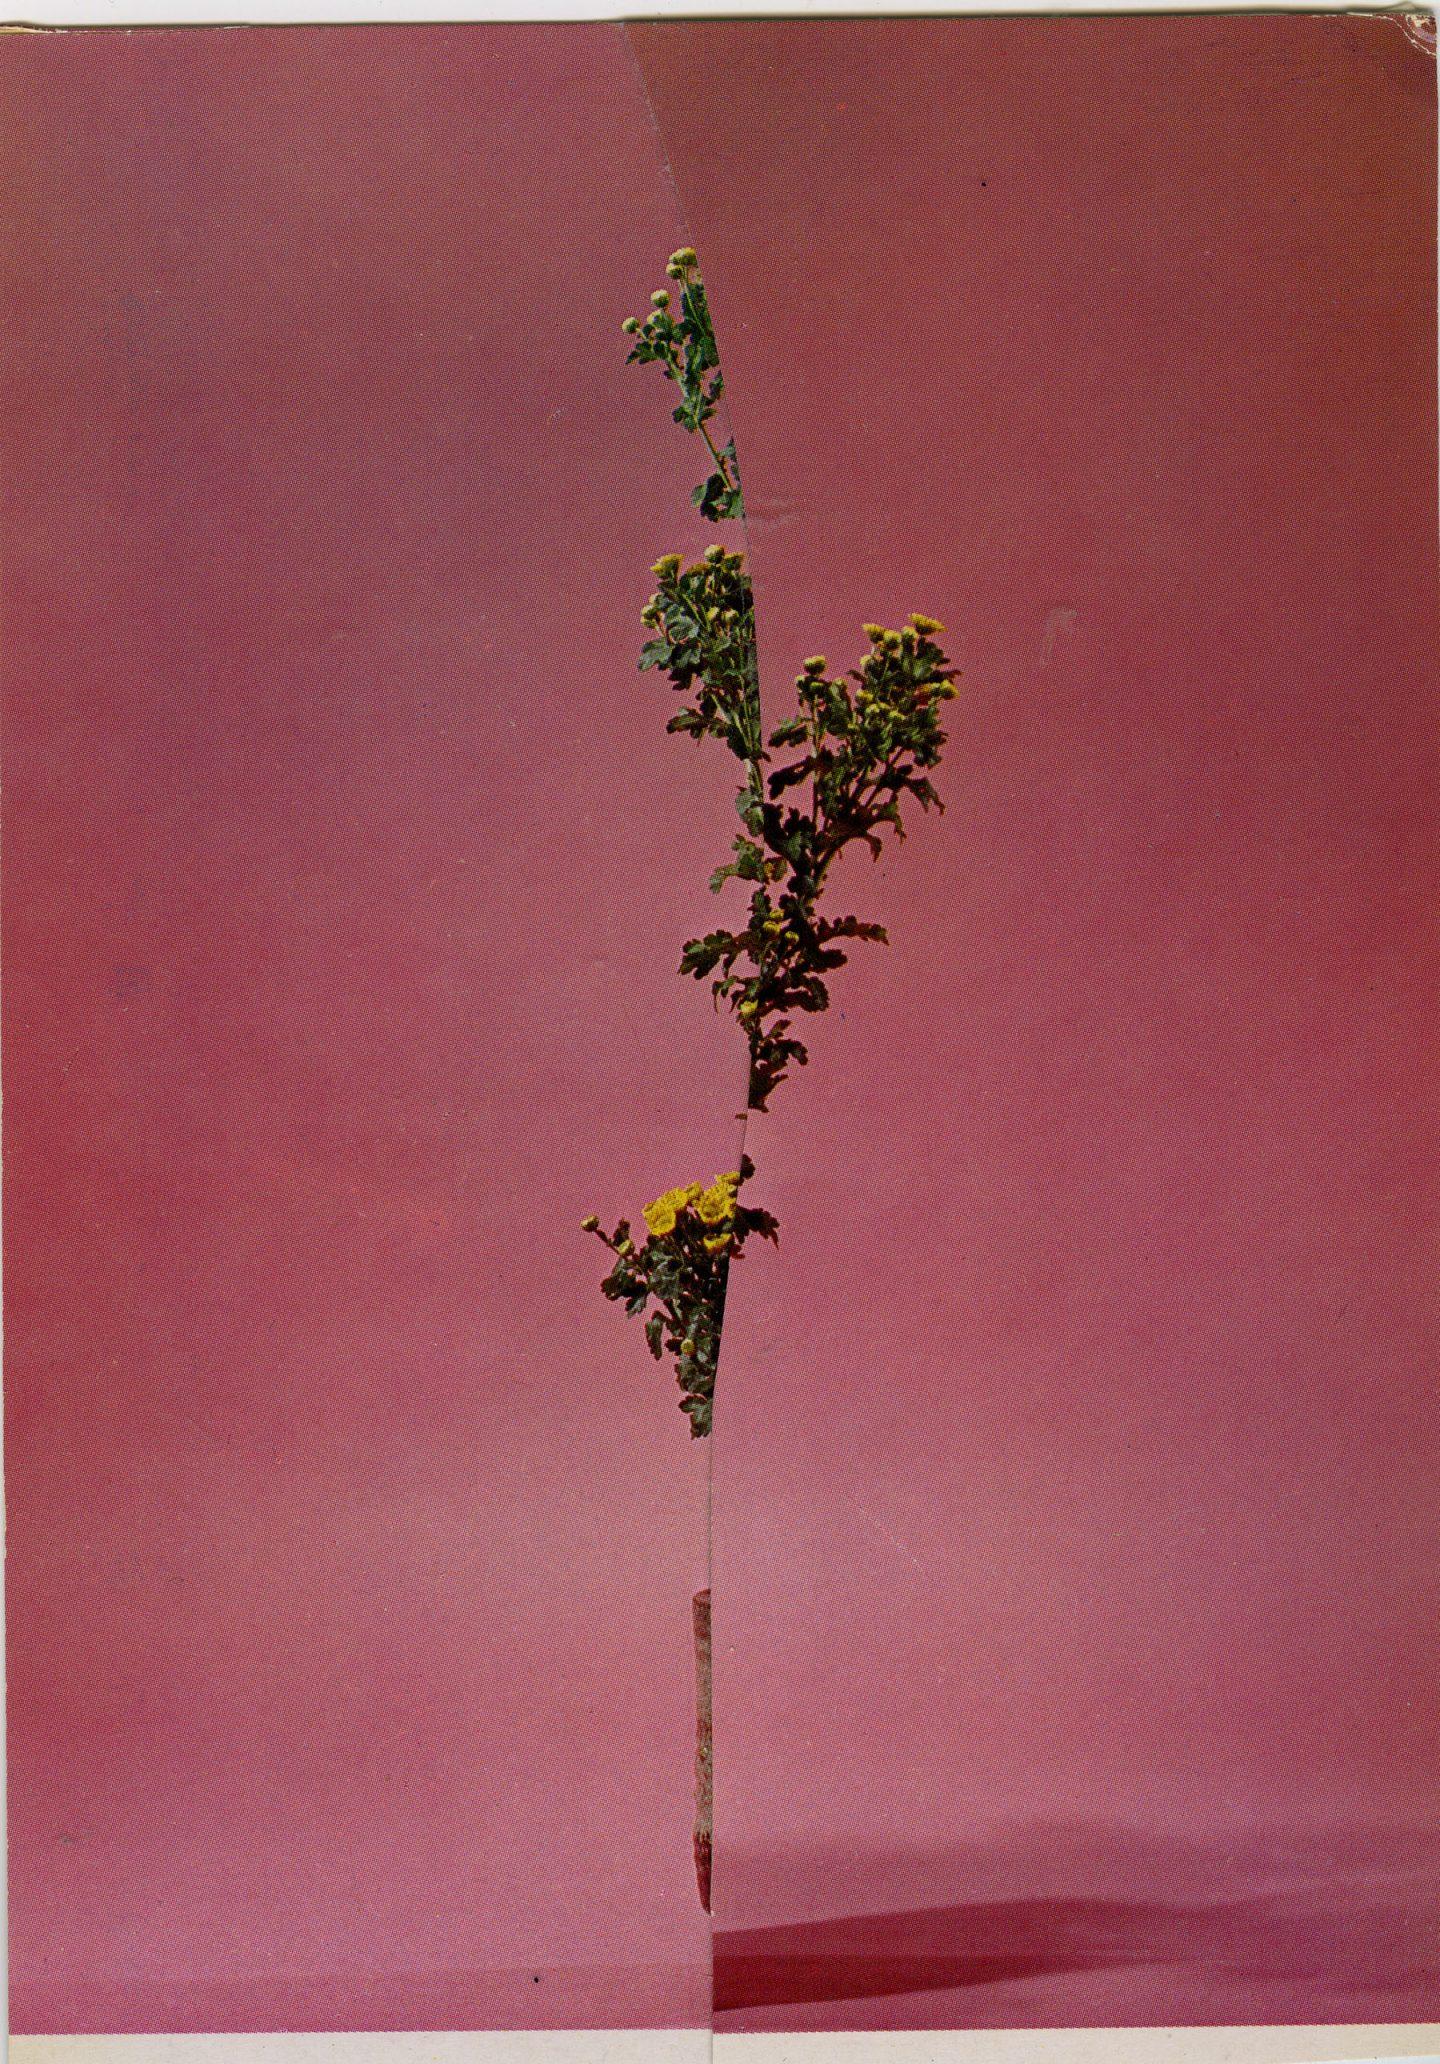 iGNANT-Art-Nicola-Kloosterman-Ikebana-003